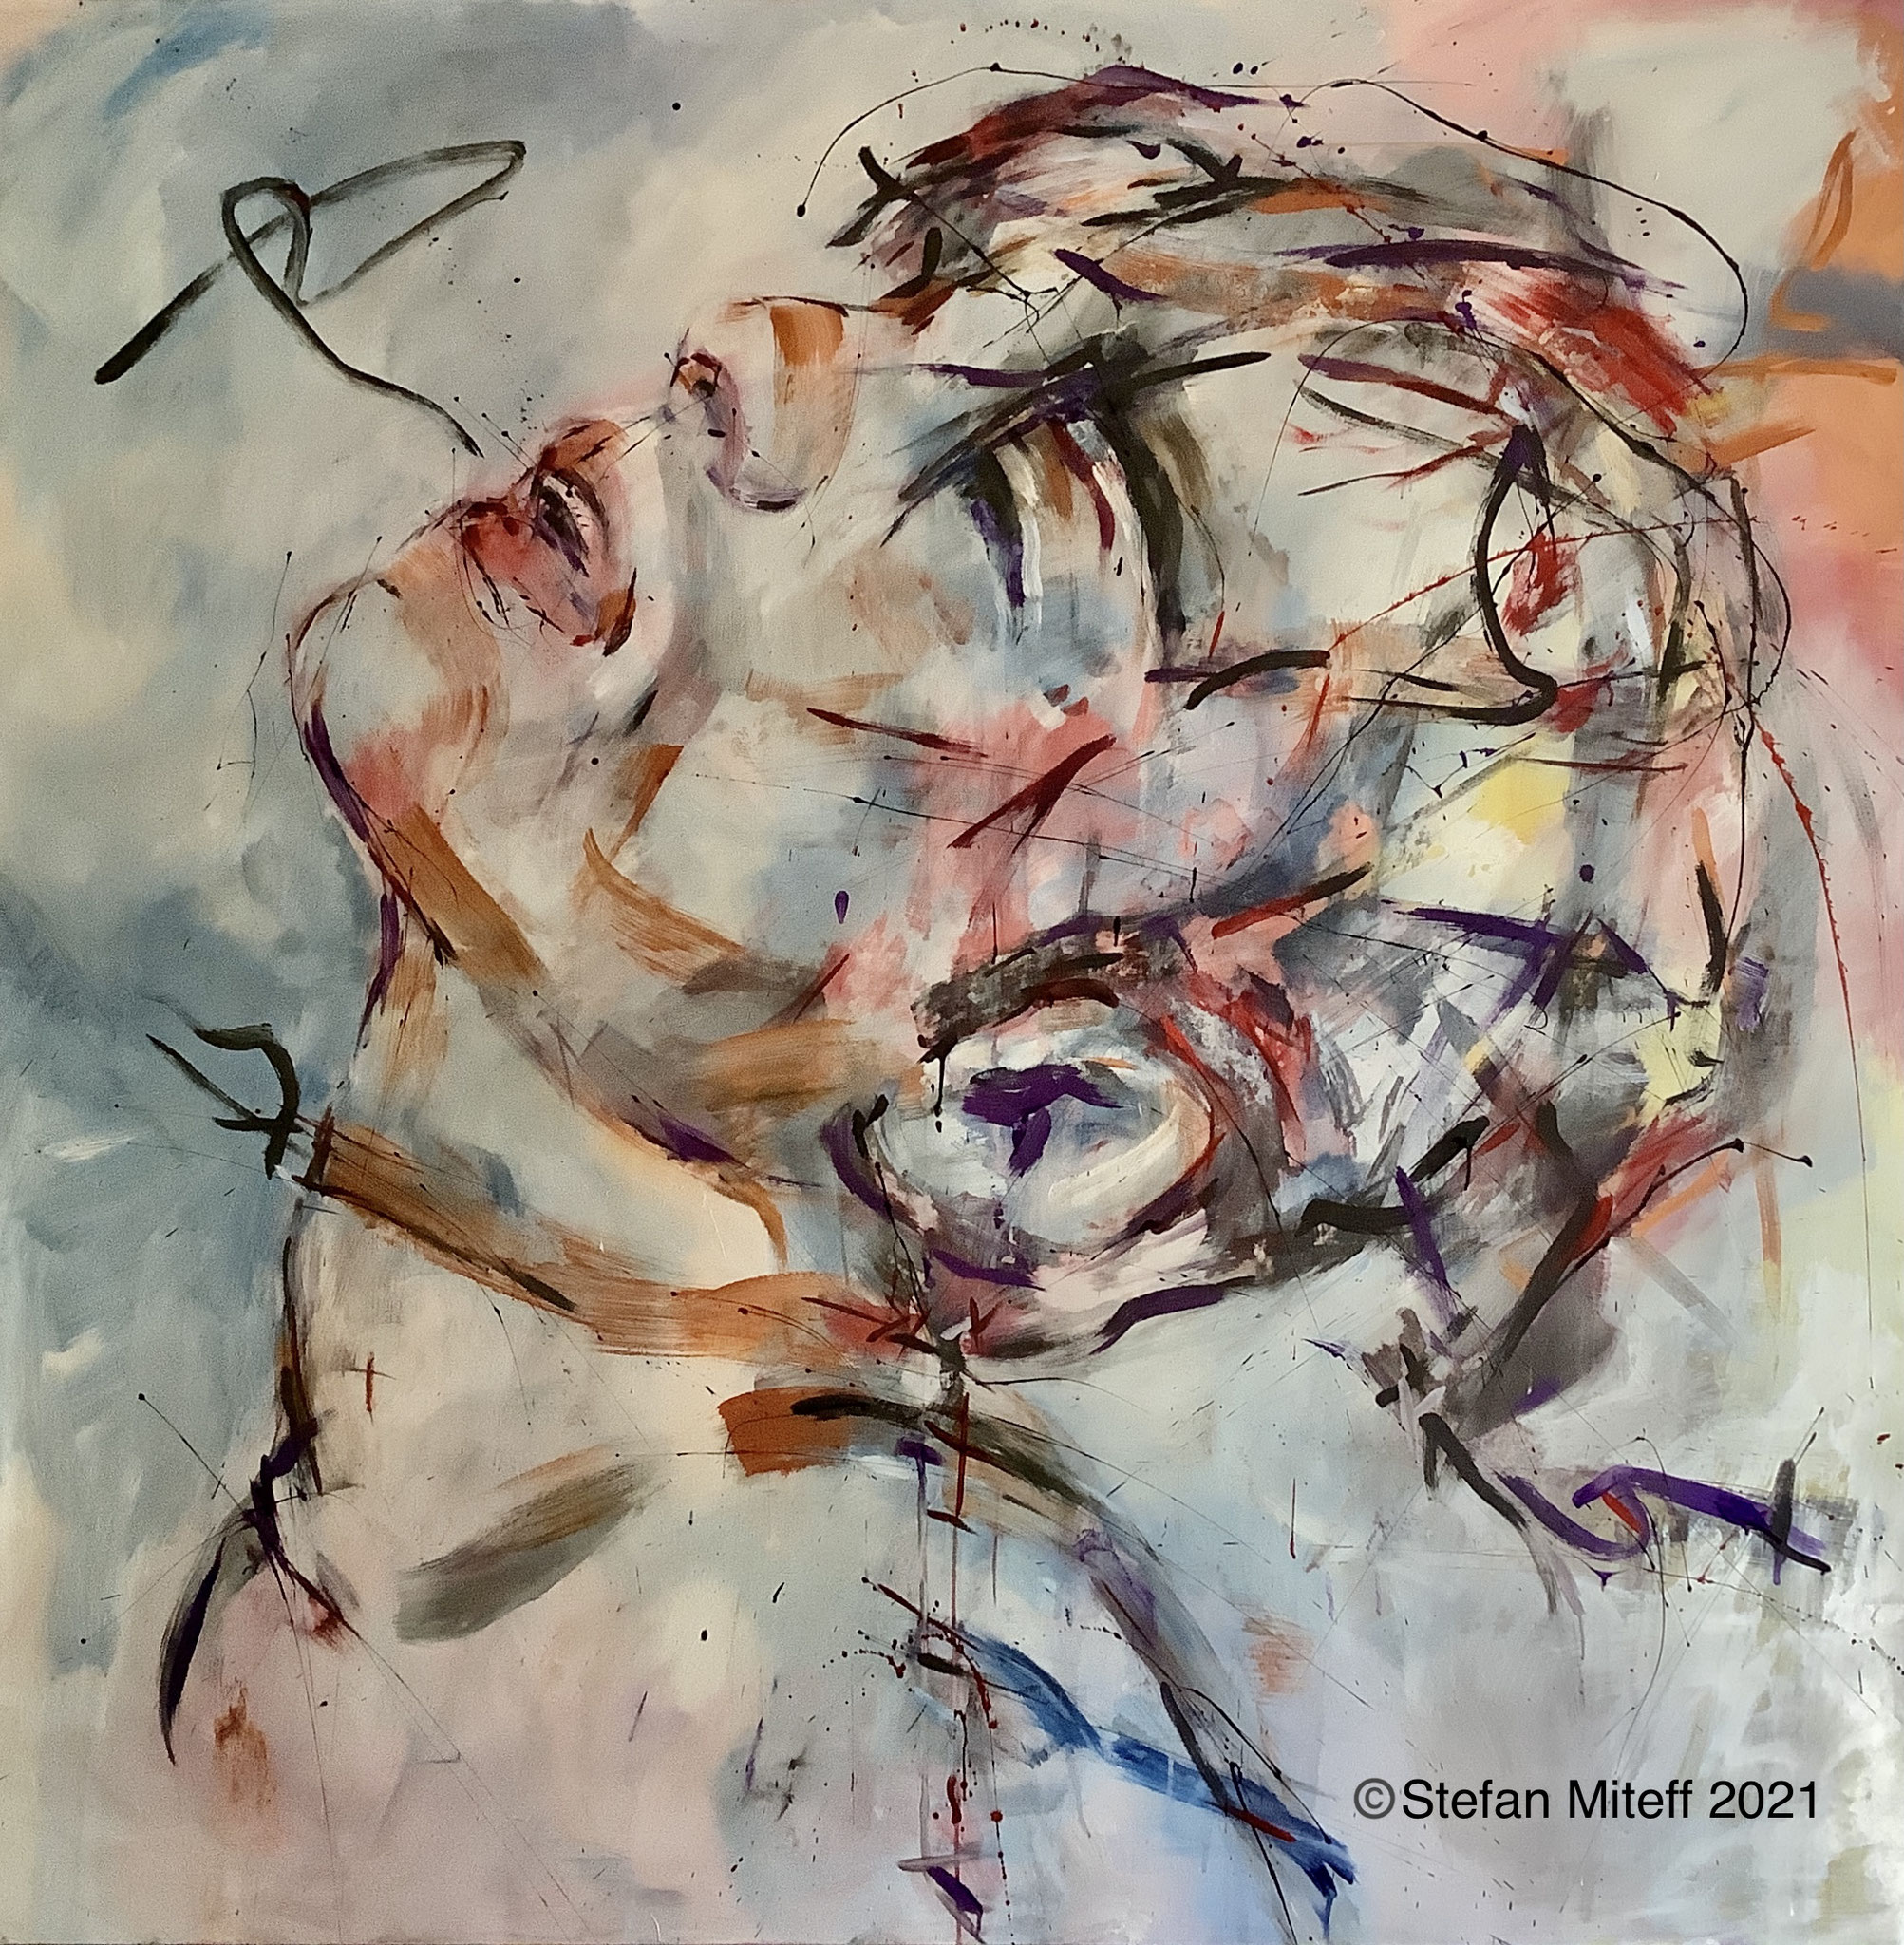 """ohne Titel"", 2021, 200cm x 200cm, Mixed Media On Canvas, ©️Stefan Miteff 2021"